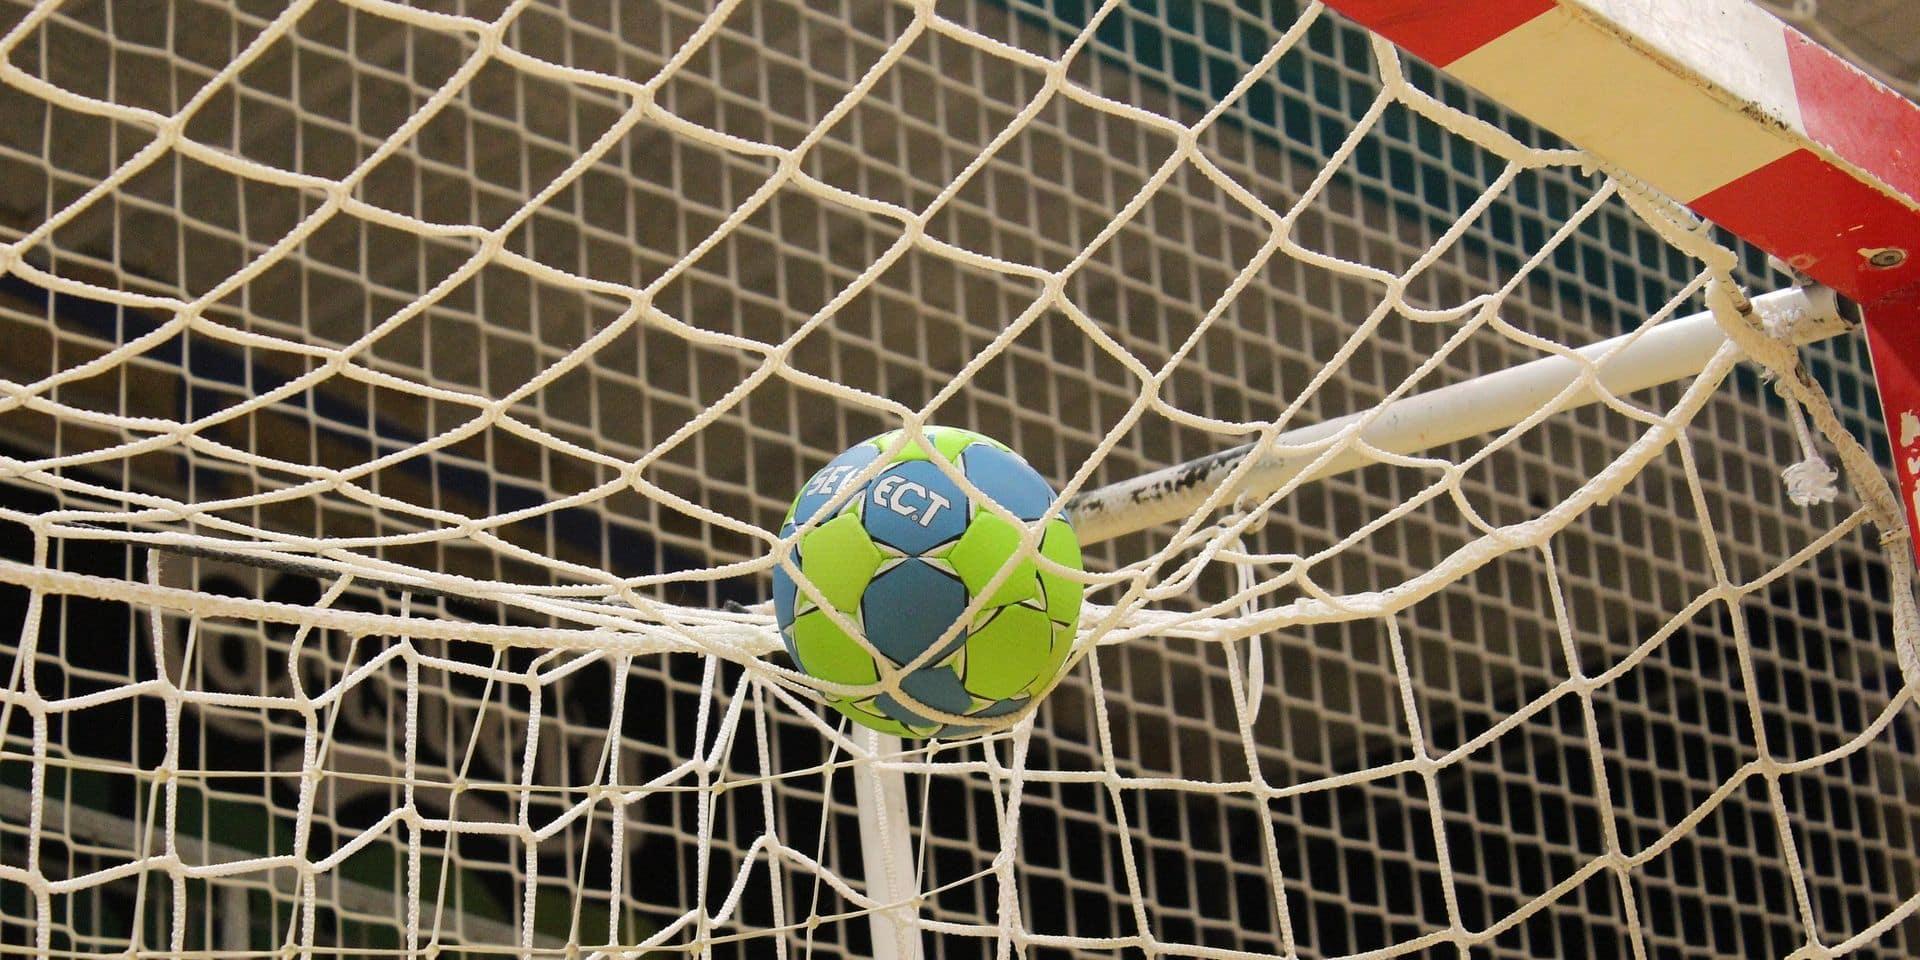 Handball: deux des meilleurs clubs belges envisagent de fusionner